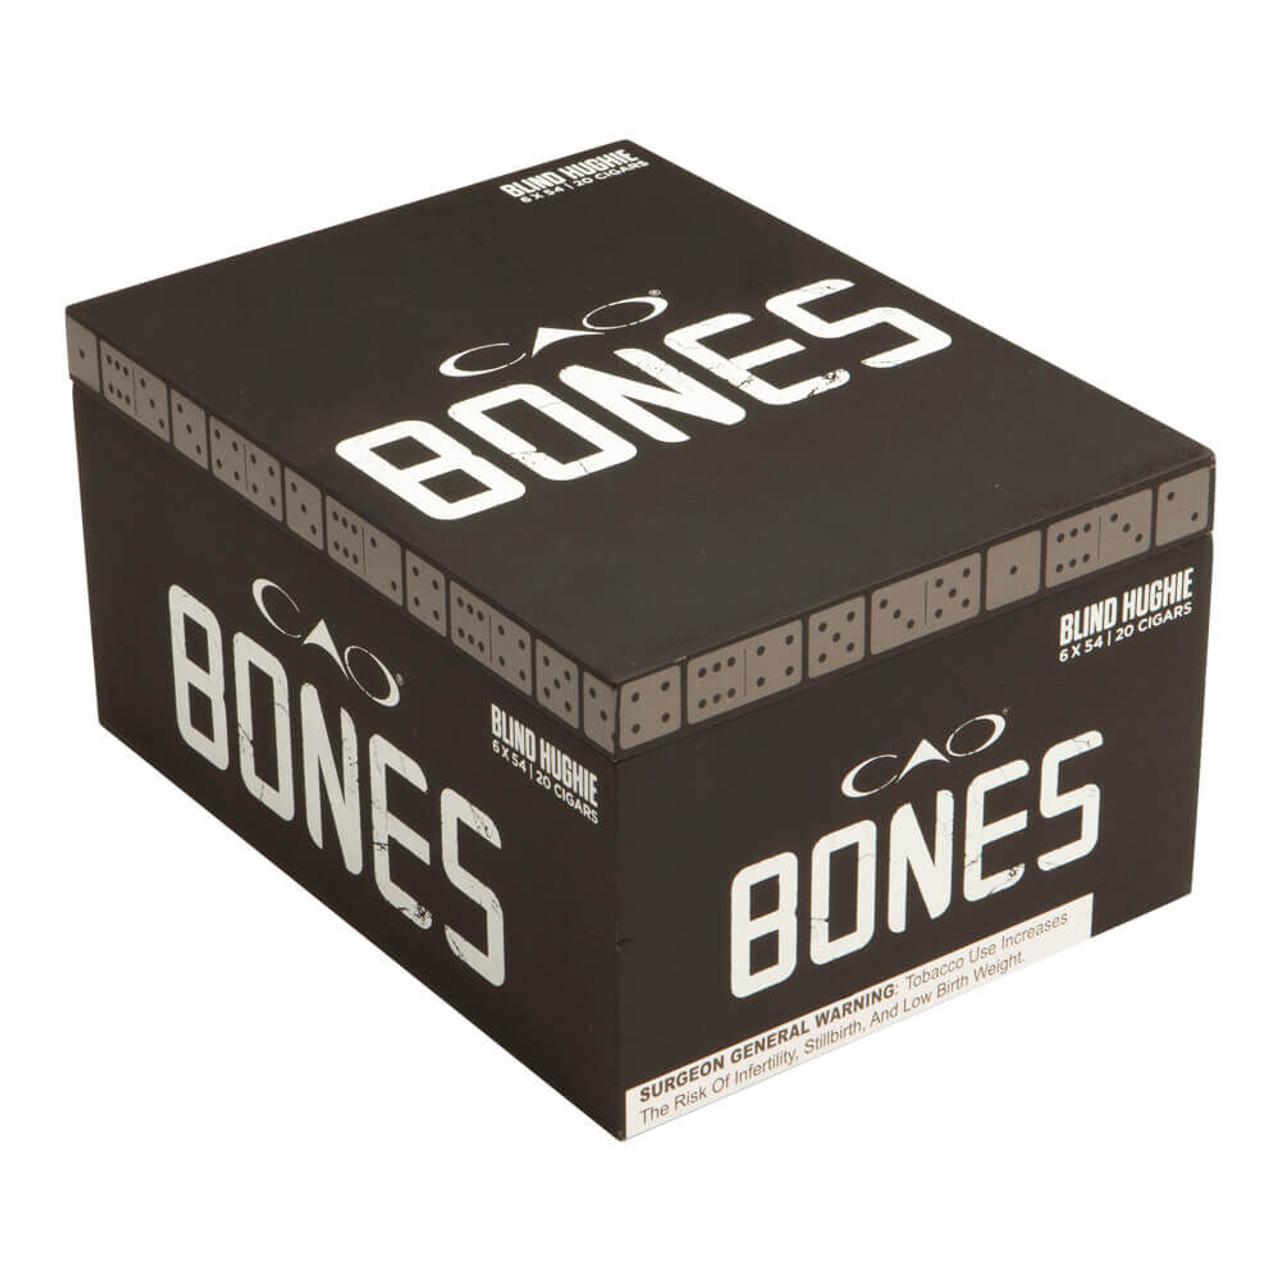 CAO Bones Blind Hughie Toro Cigars - 6.0 x 54 (Box of 20)